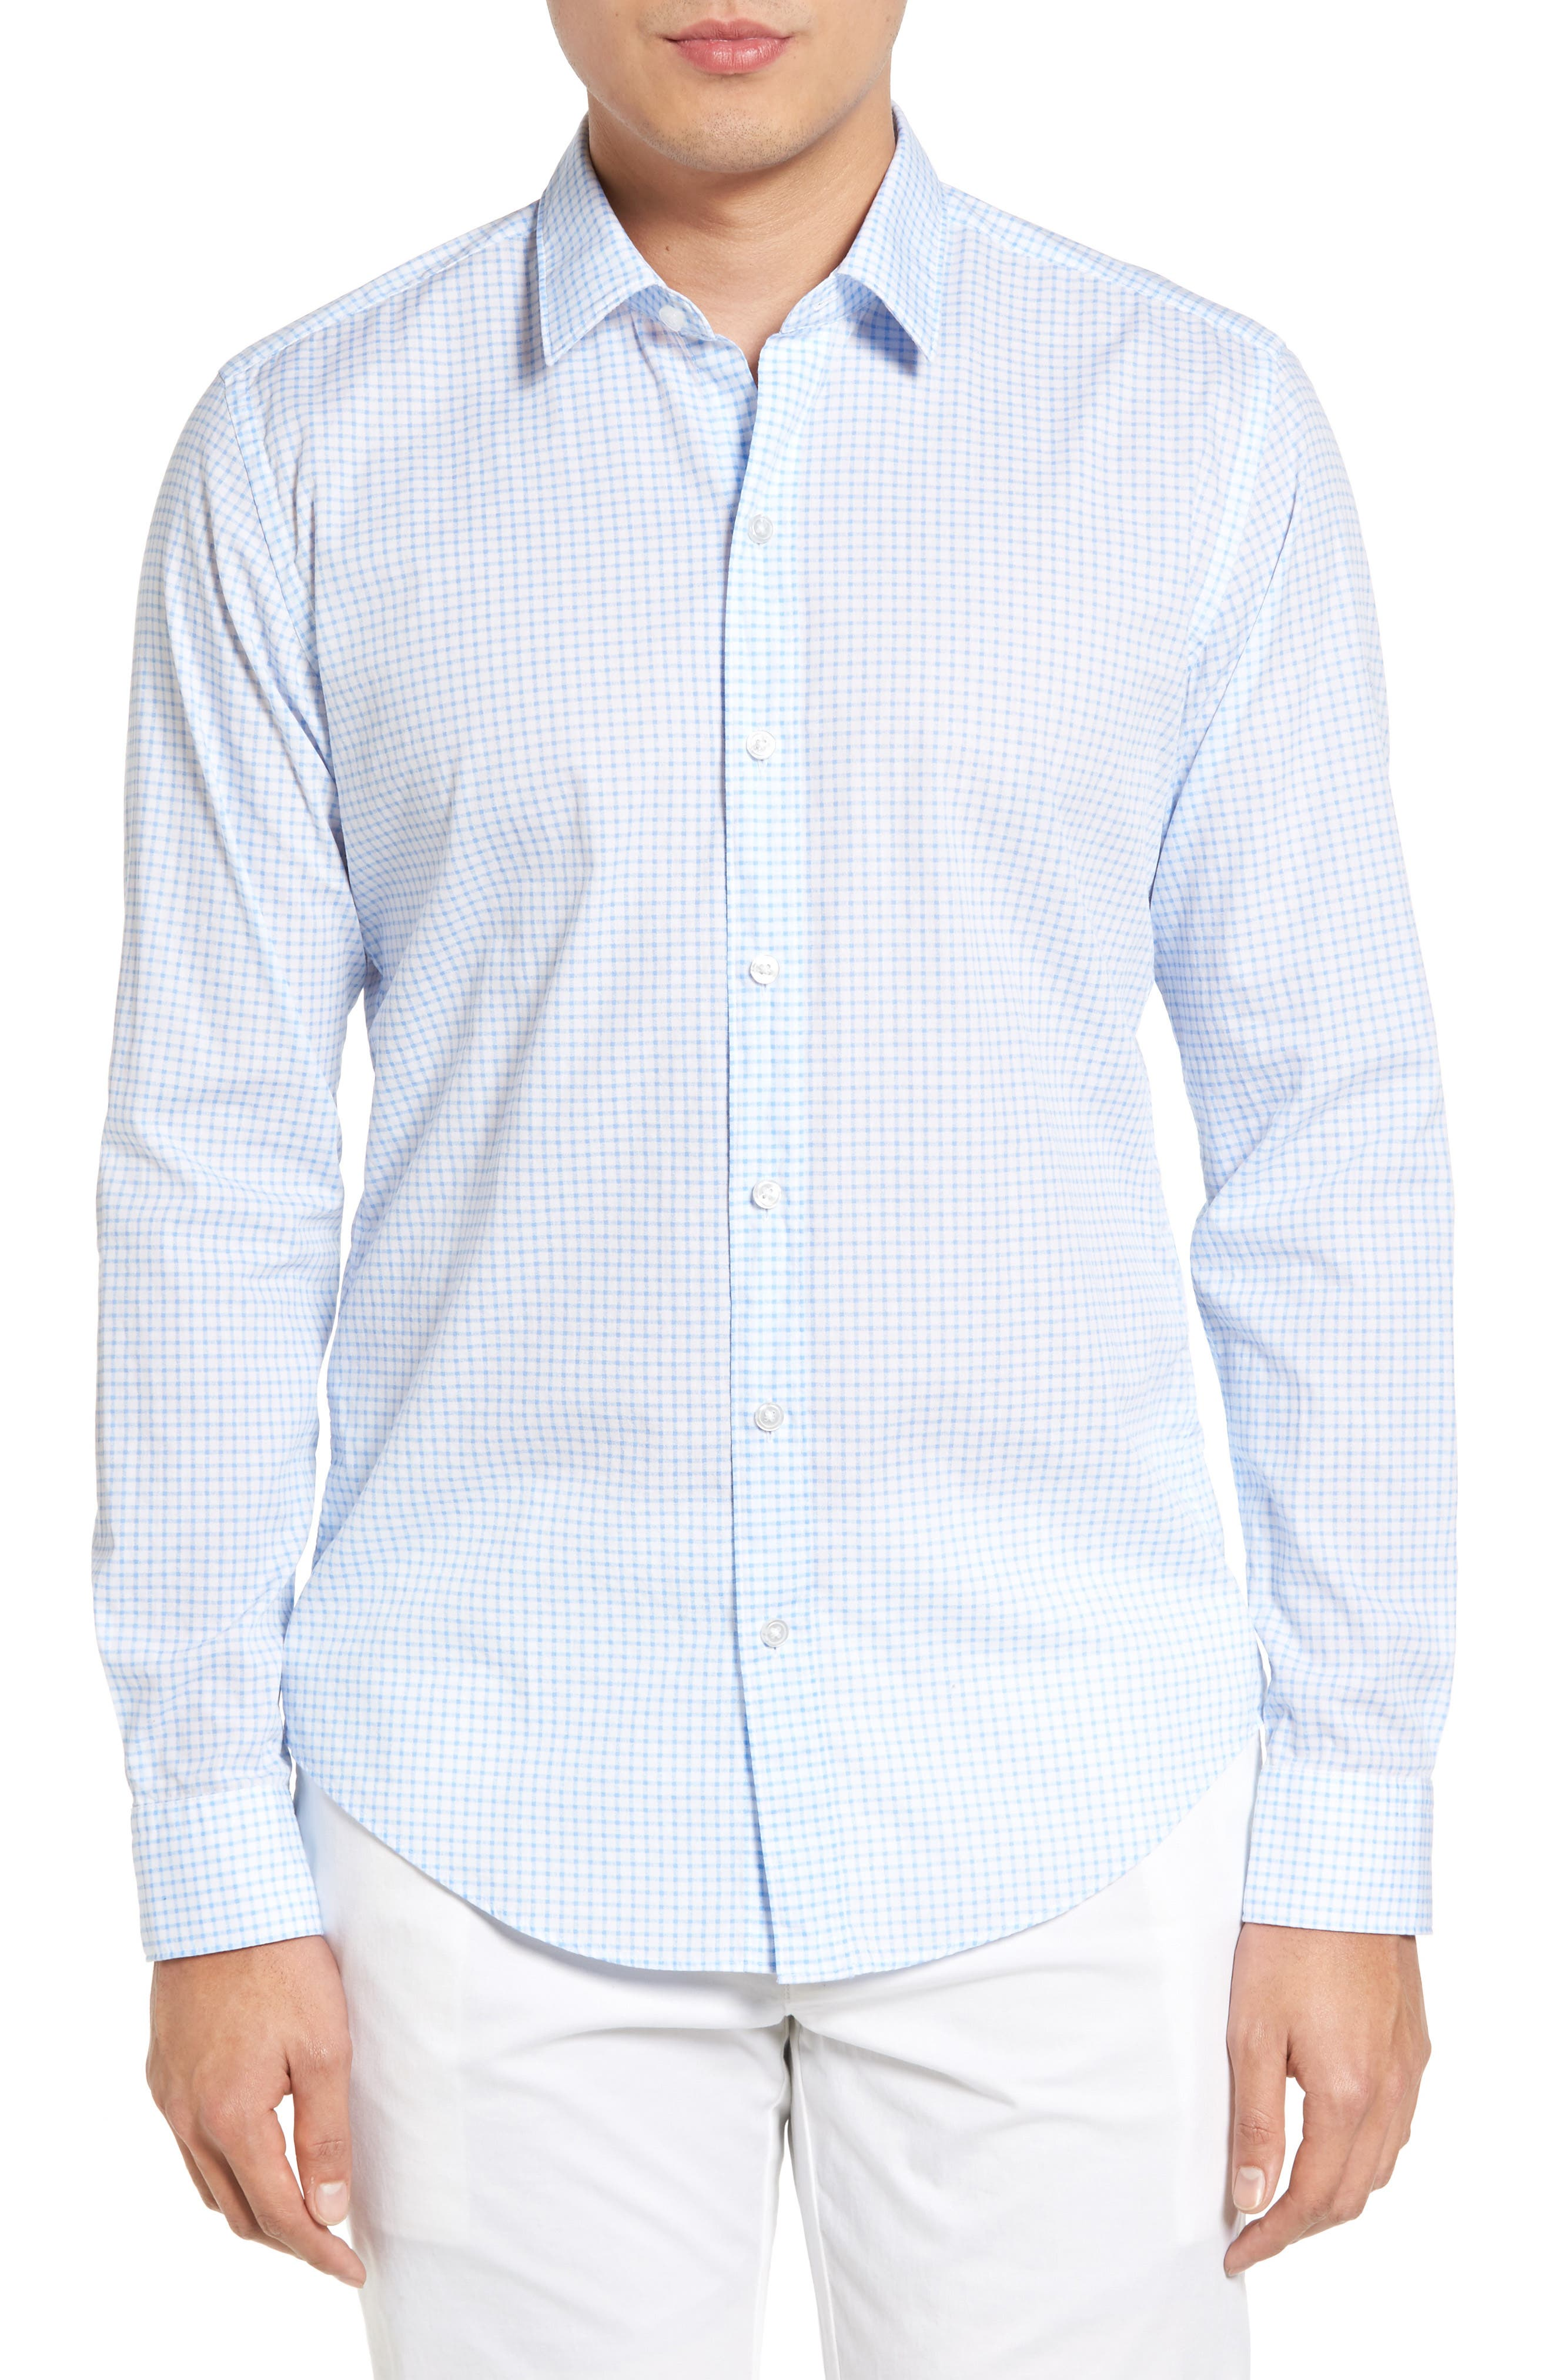 Robbie Trim Fit Check Sport Shirt,                         Main,                         color, 100